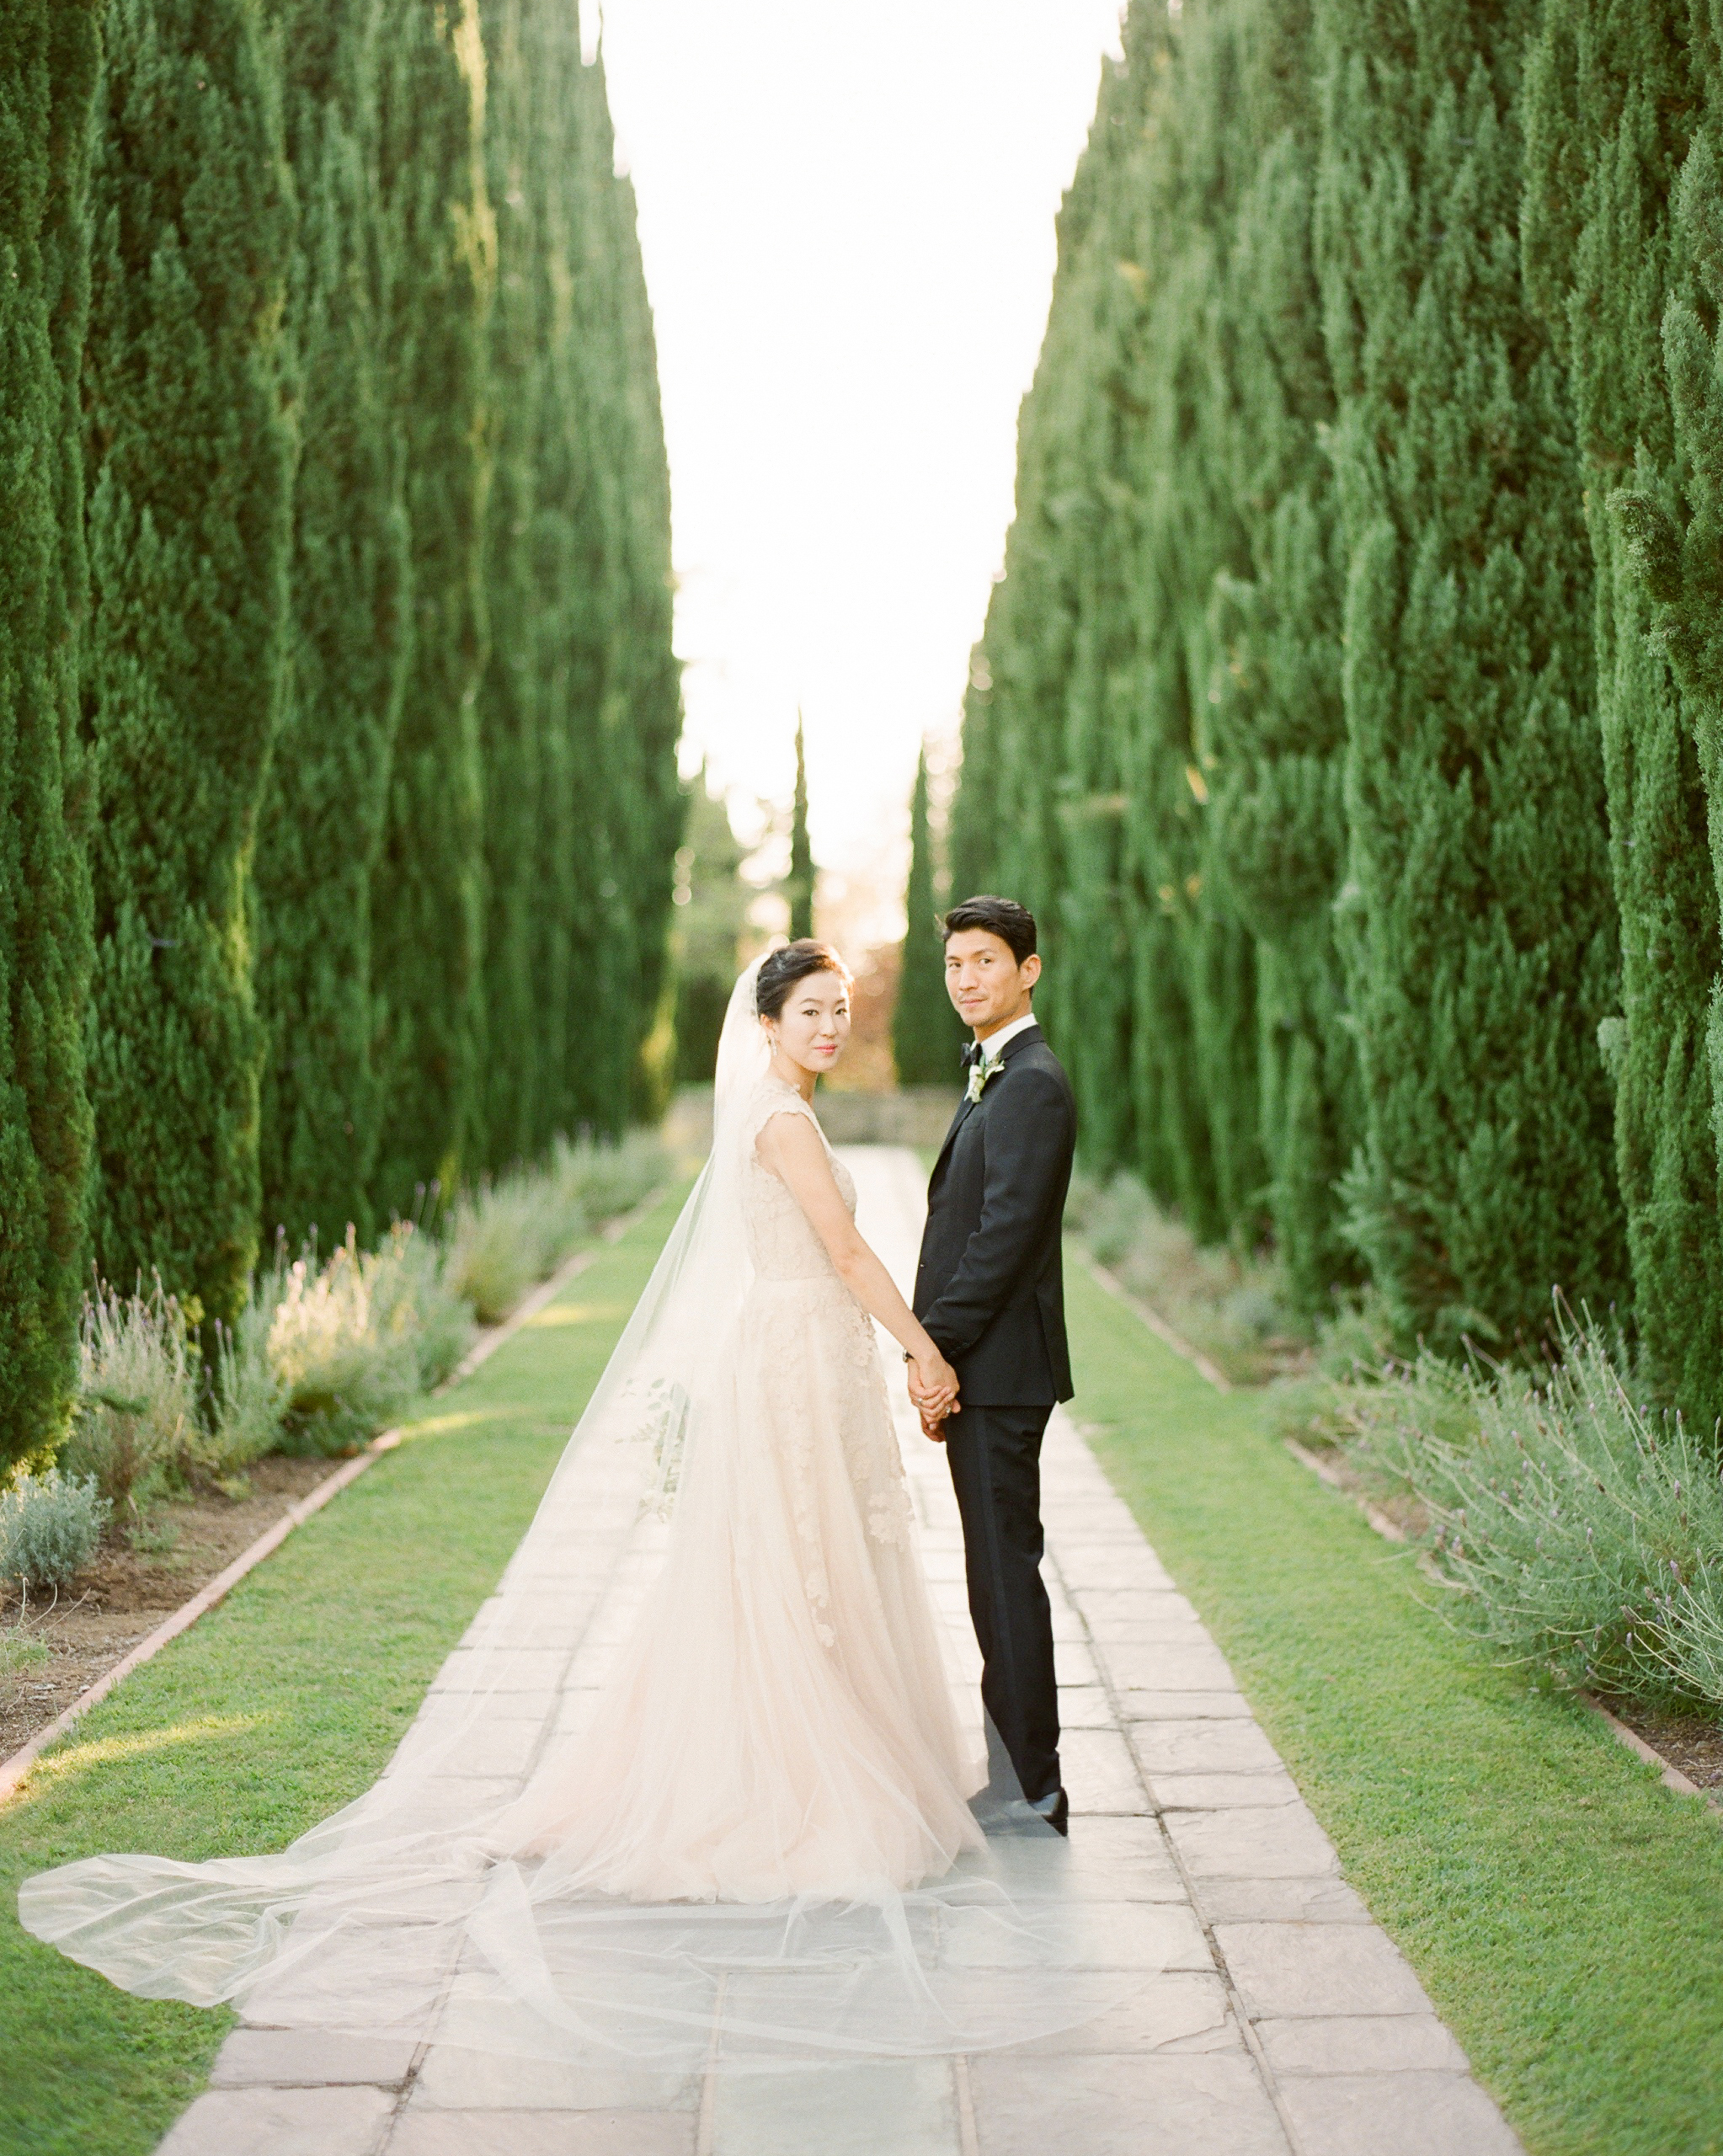 annie-tad-wedding-0247-s111160.jpg